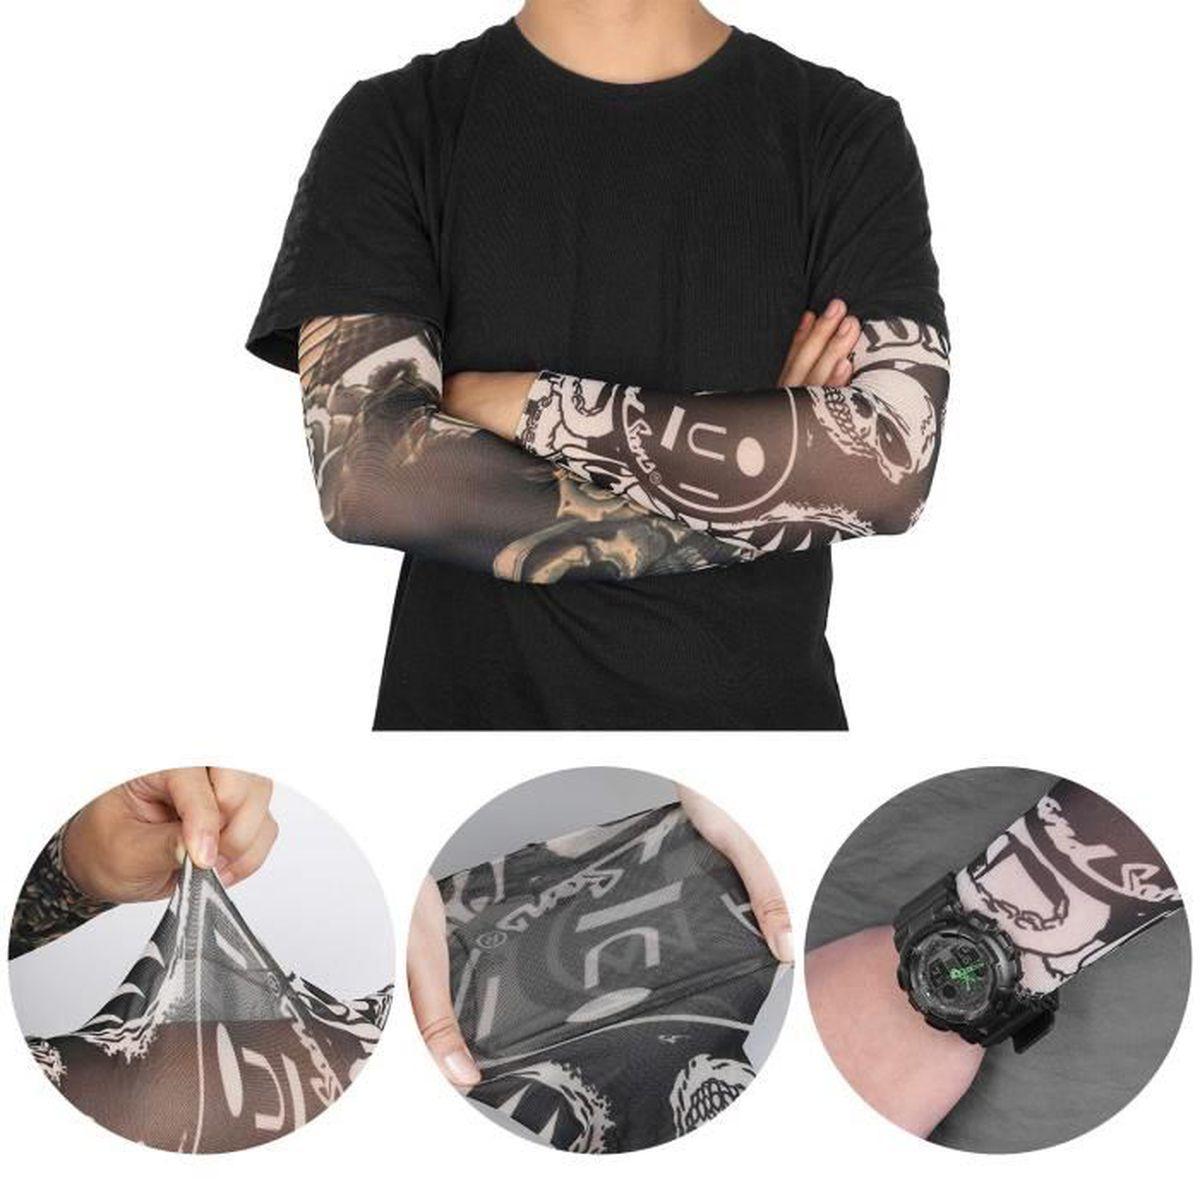 iKulilky Faux Tatouage Manches Bras Manchette Tatoo Collant Dessins Manches Bras Sportifs Tatouage Bras Couvre Nylon Sleeve 6 Mod/èles Diff/érents